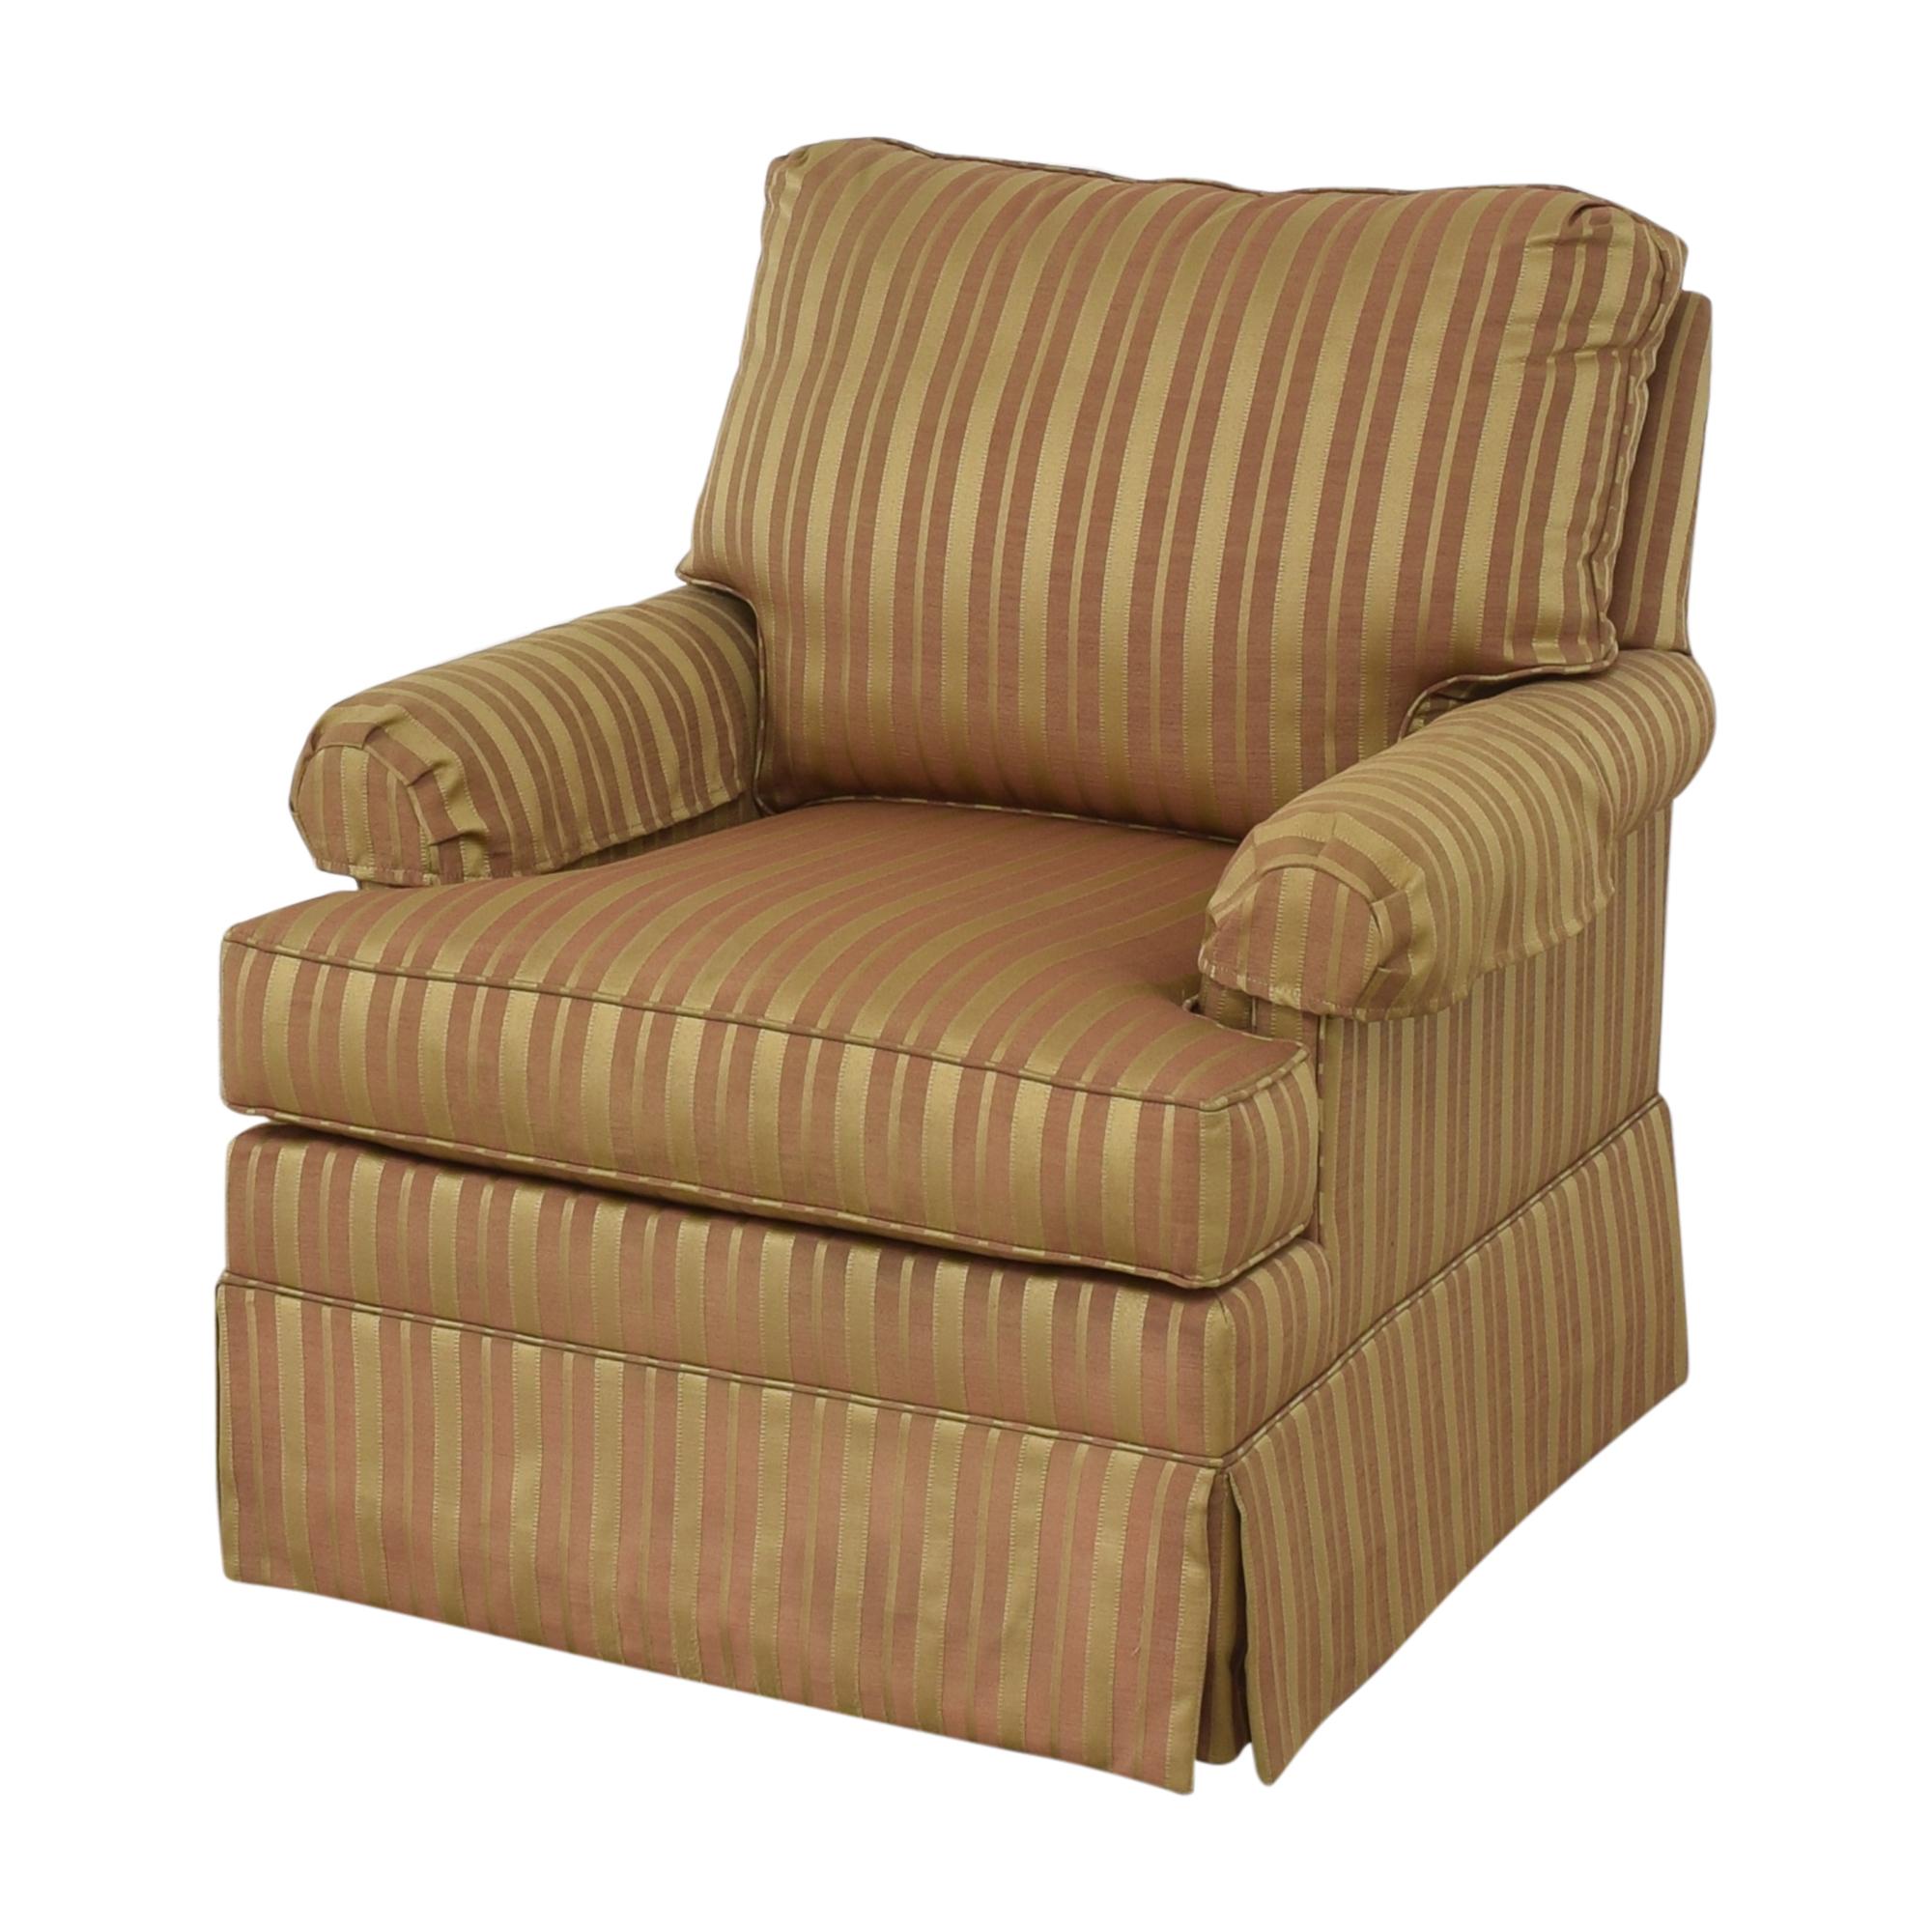 Ethan Allen Ethan Allen Mr. Chair on sale